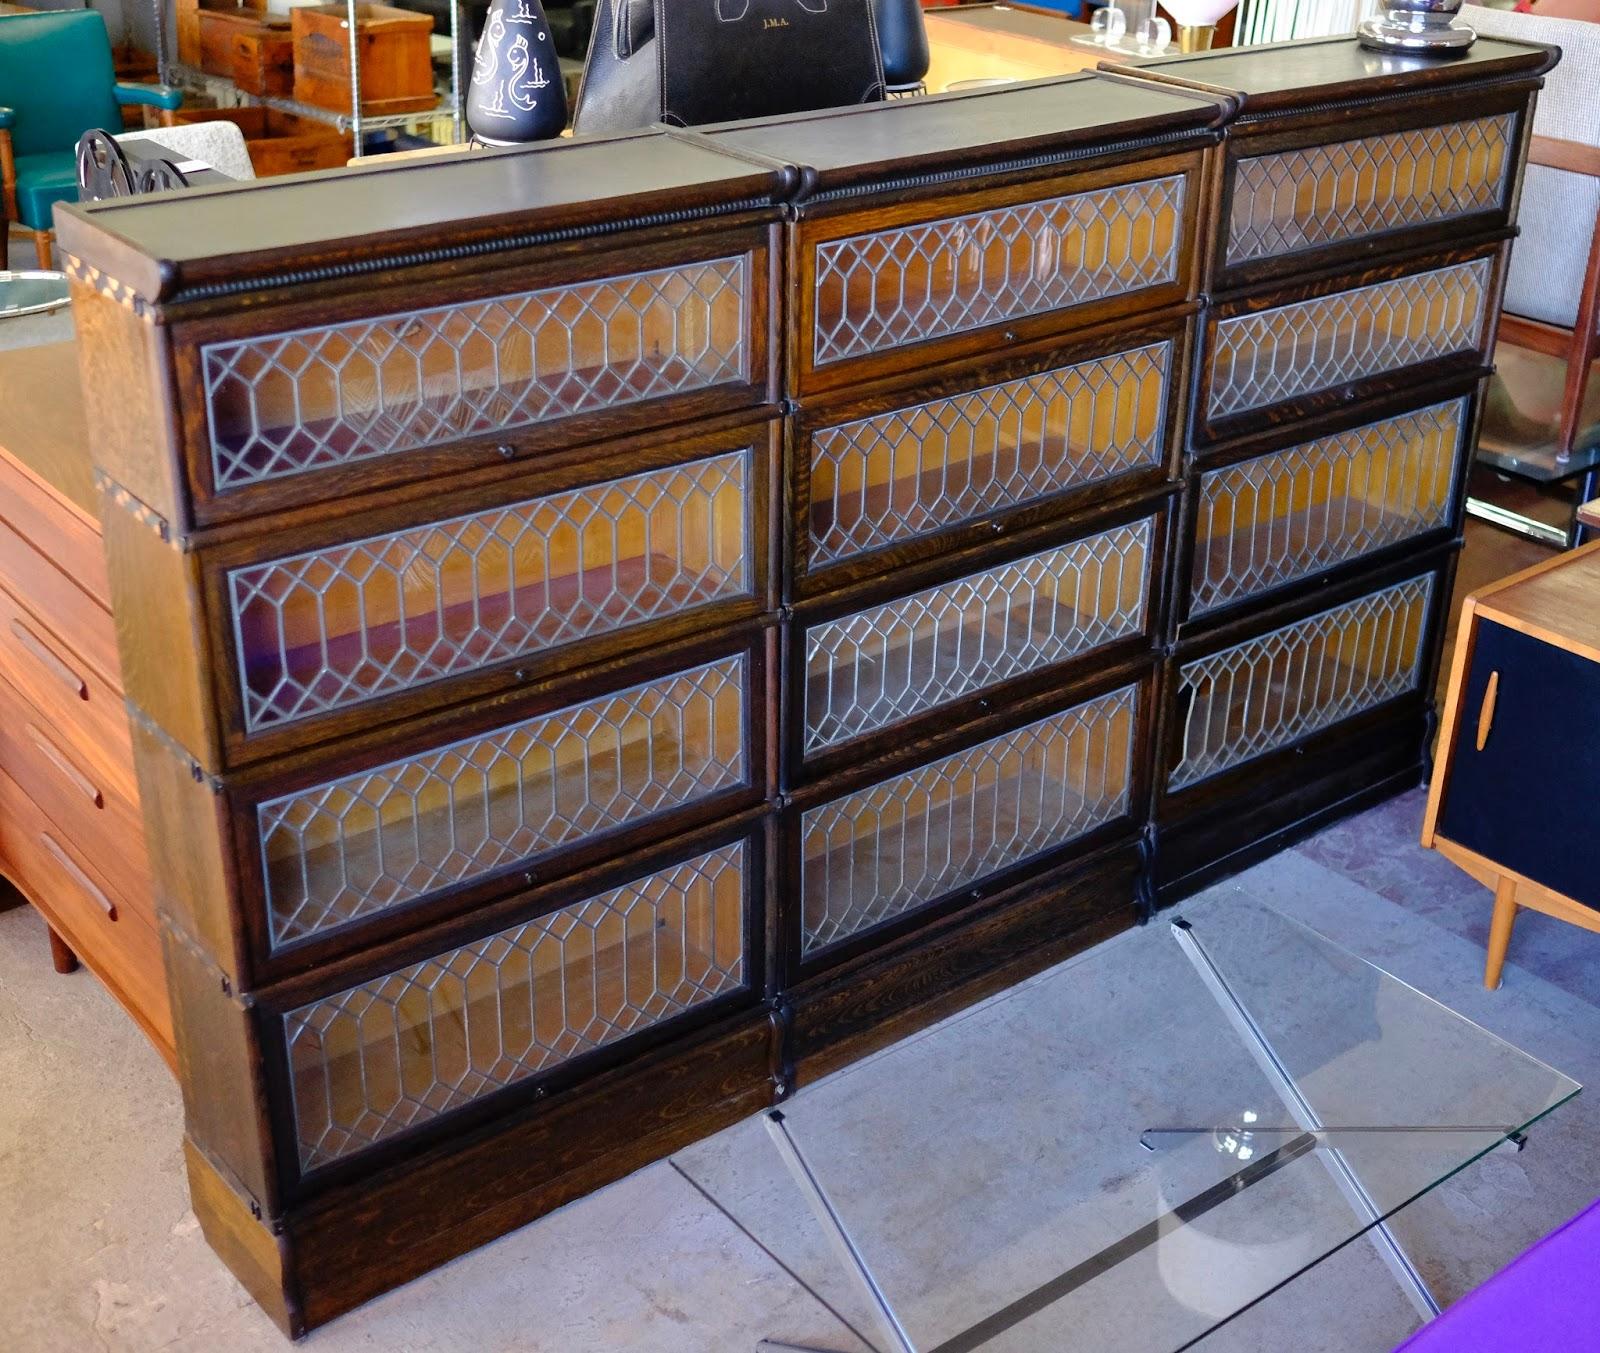 barrister bookcases amish artesabarristerbookcase direct shop furniture artesa office bookcase